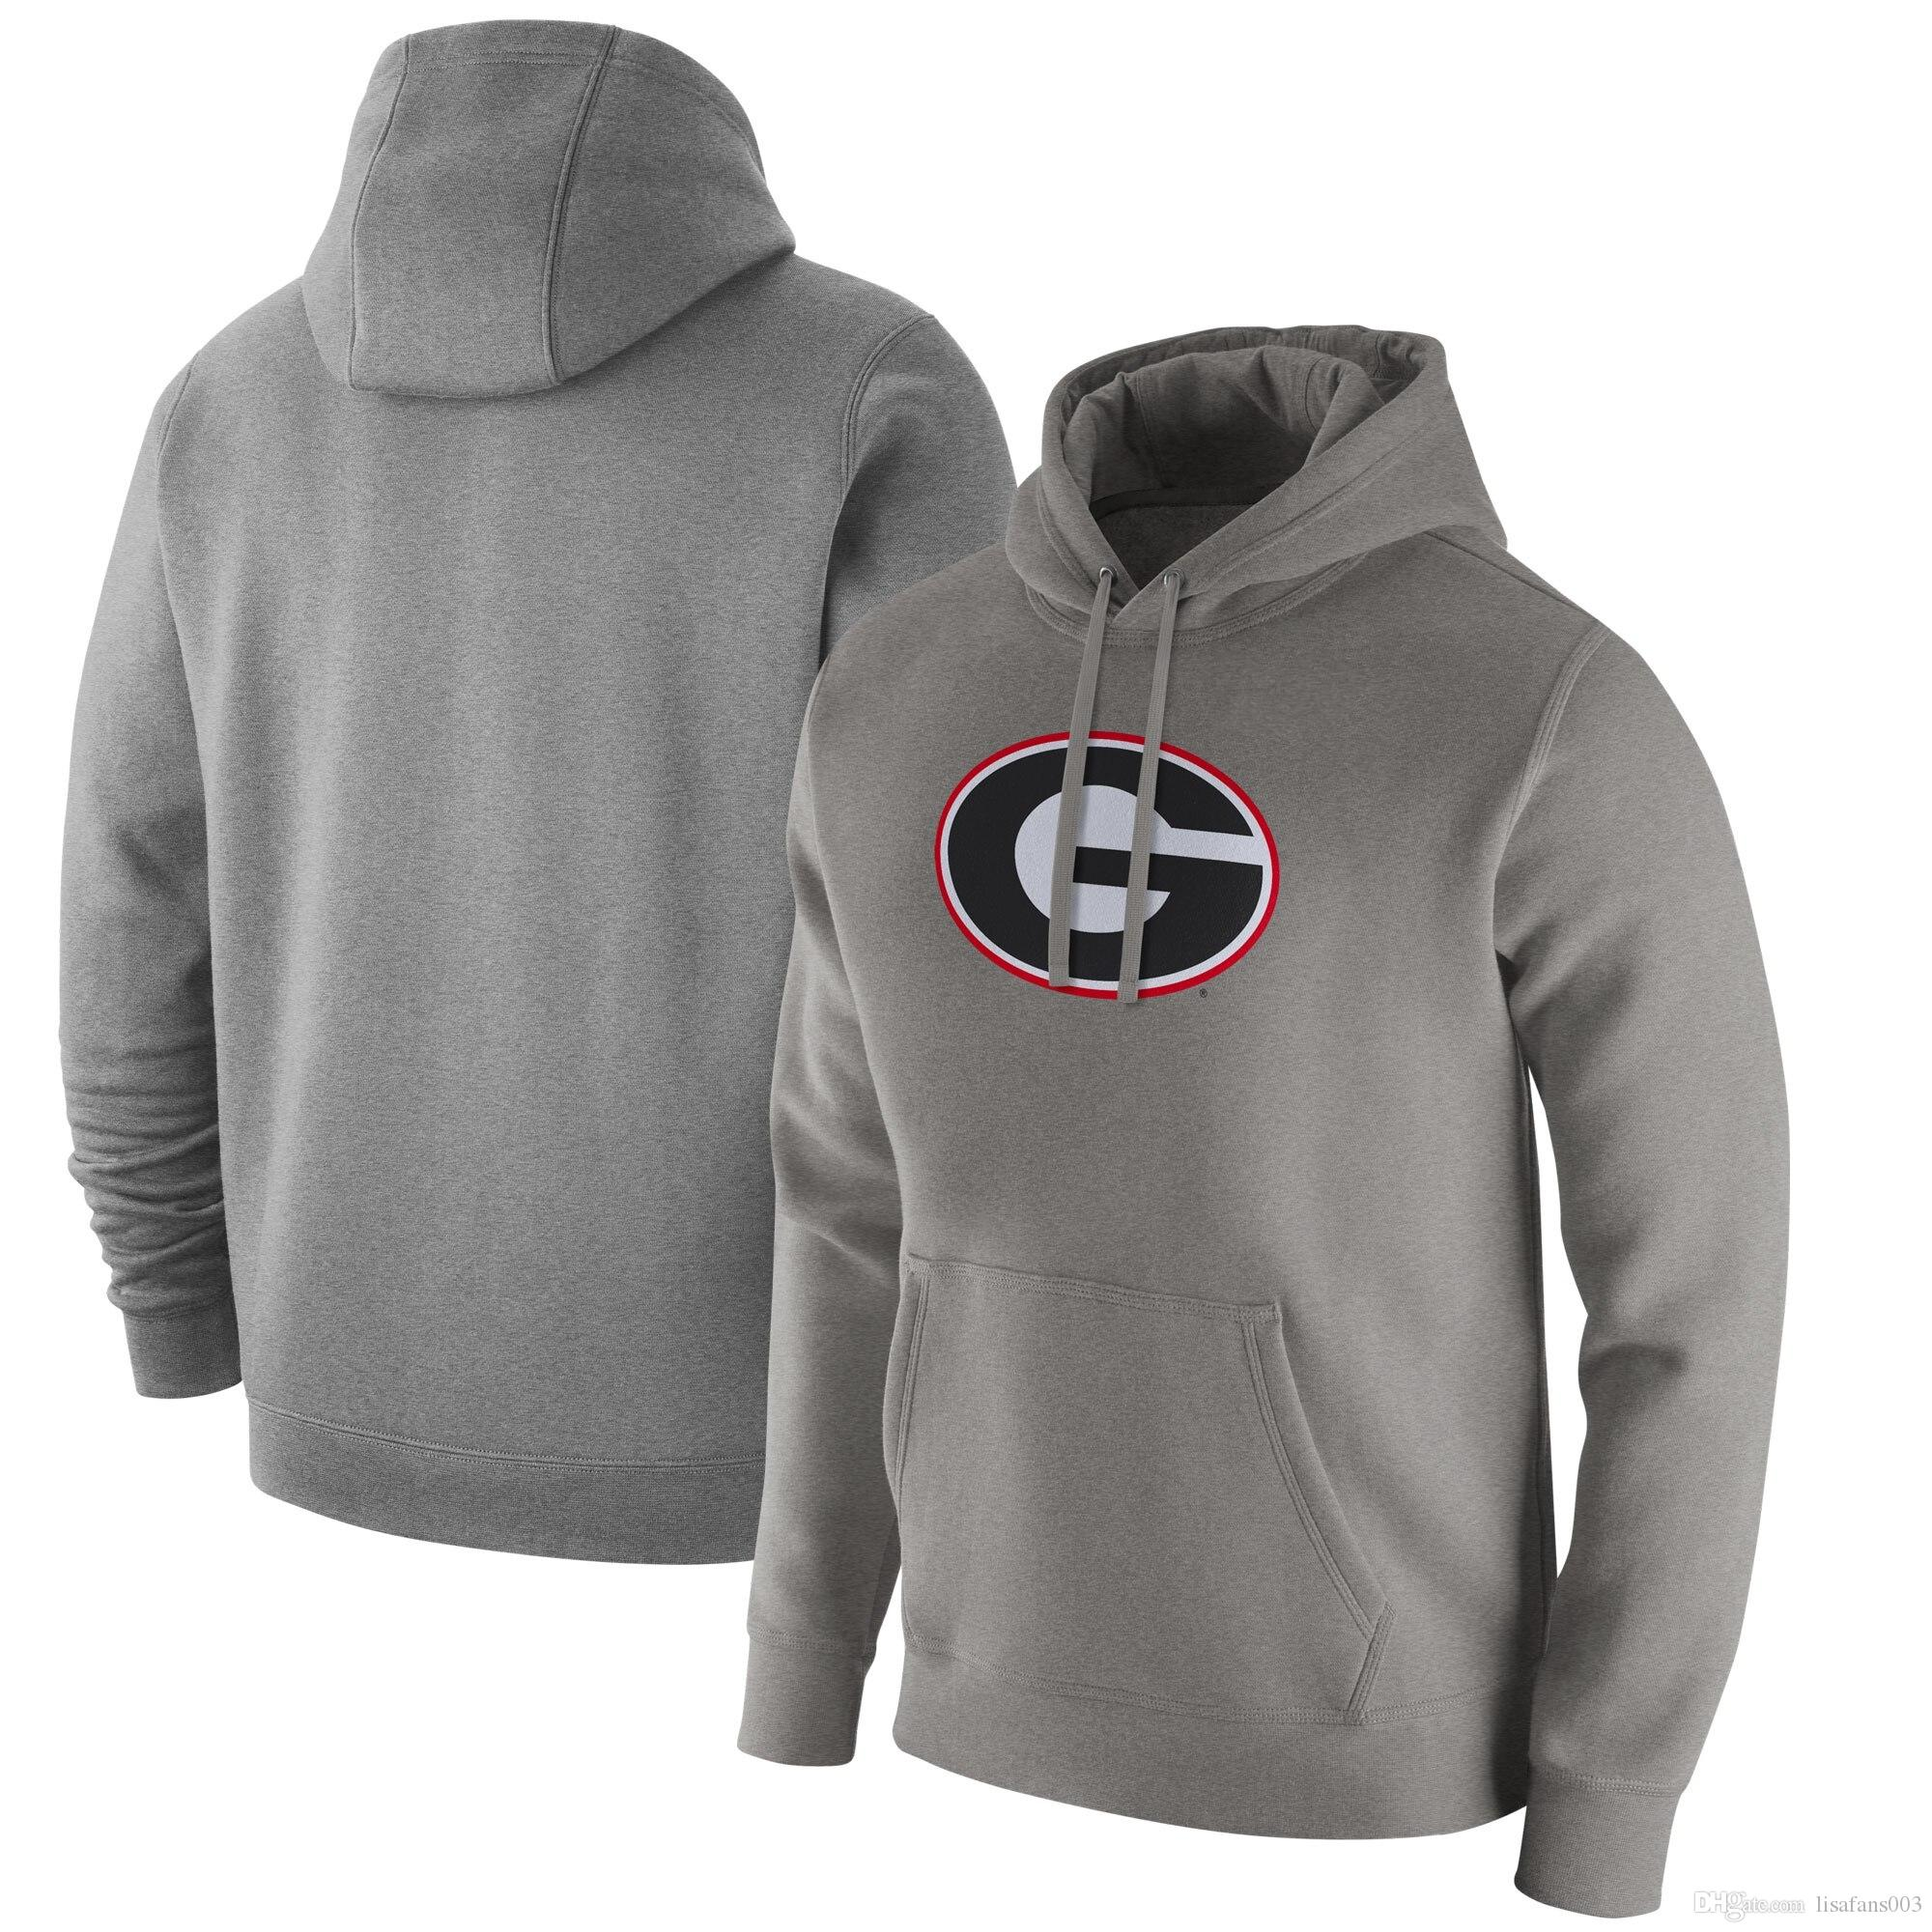 Logotipo de Georgia Bulldogs Club Red Fleece Sudadera con capucha para Army Black Knights Duke Blue Devils para hombre con capucha gris